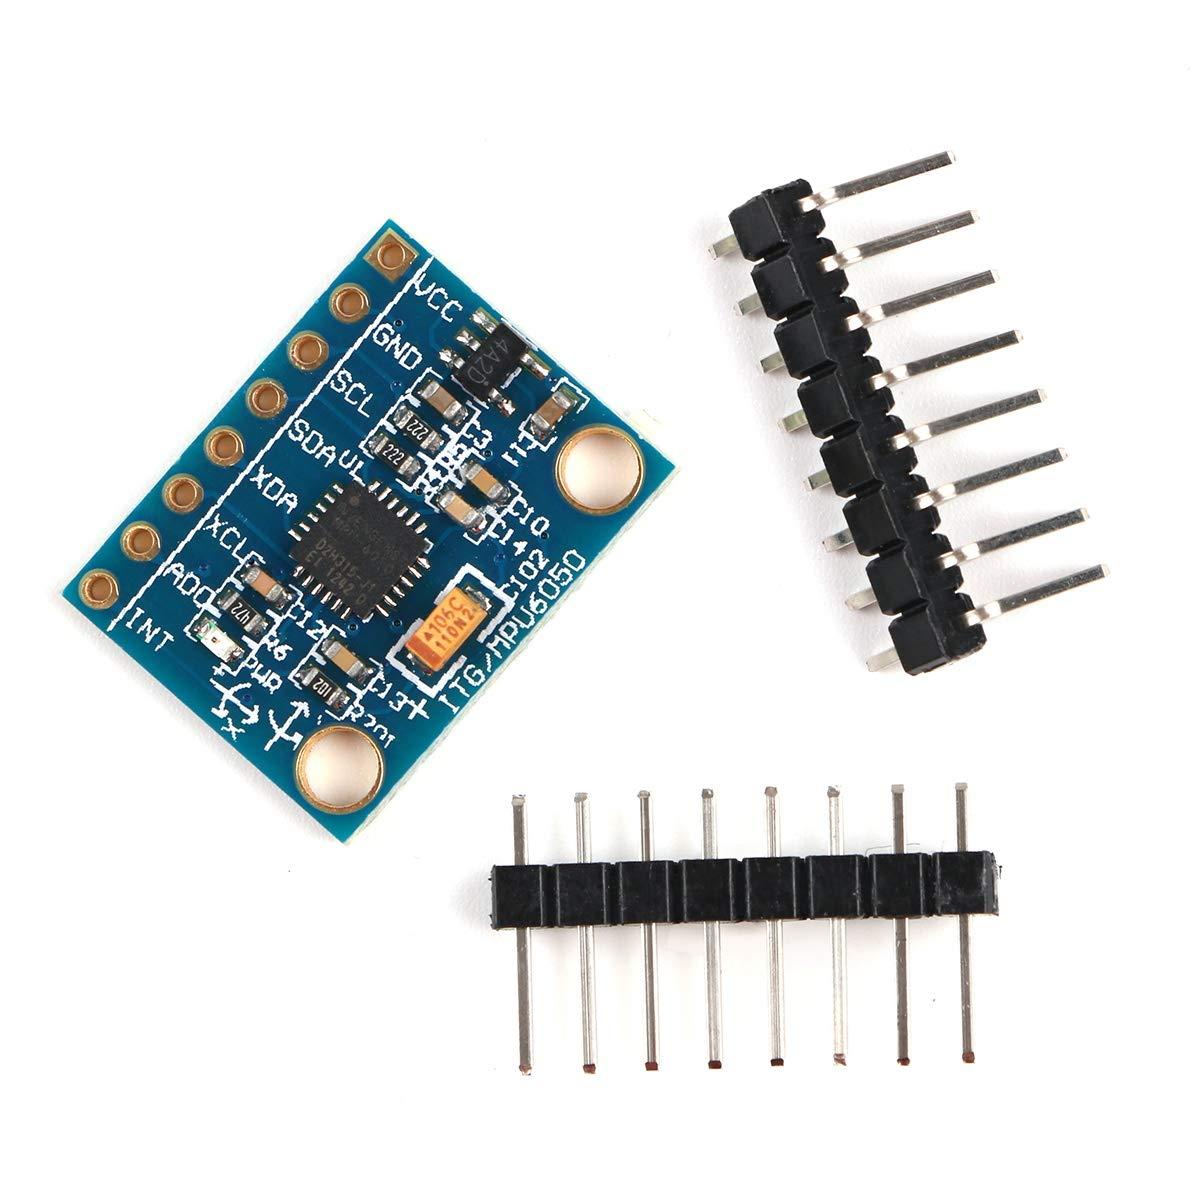 Compatible with Arduino STM32 MAX30102 Blood Oxygen Sensor MakerFocus Heart-Rate Sensor Module